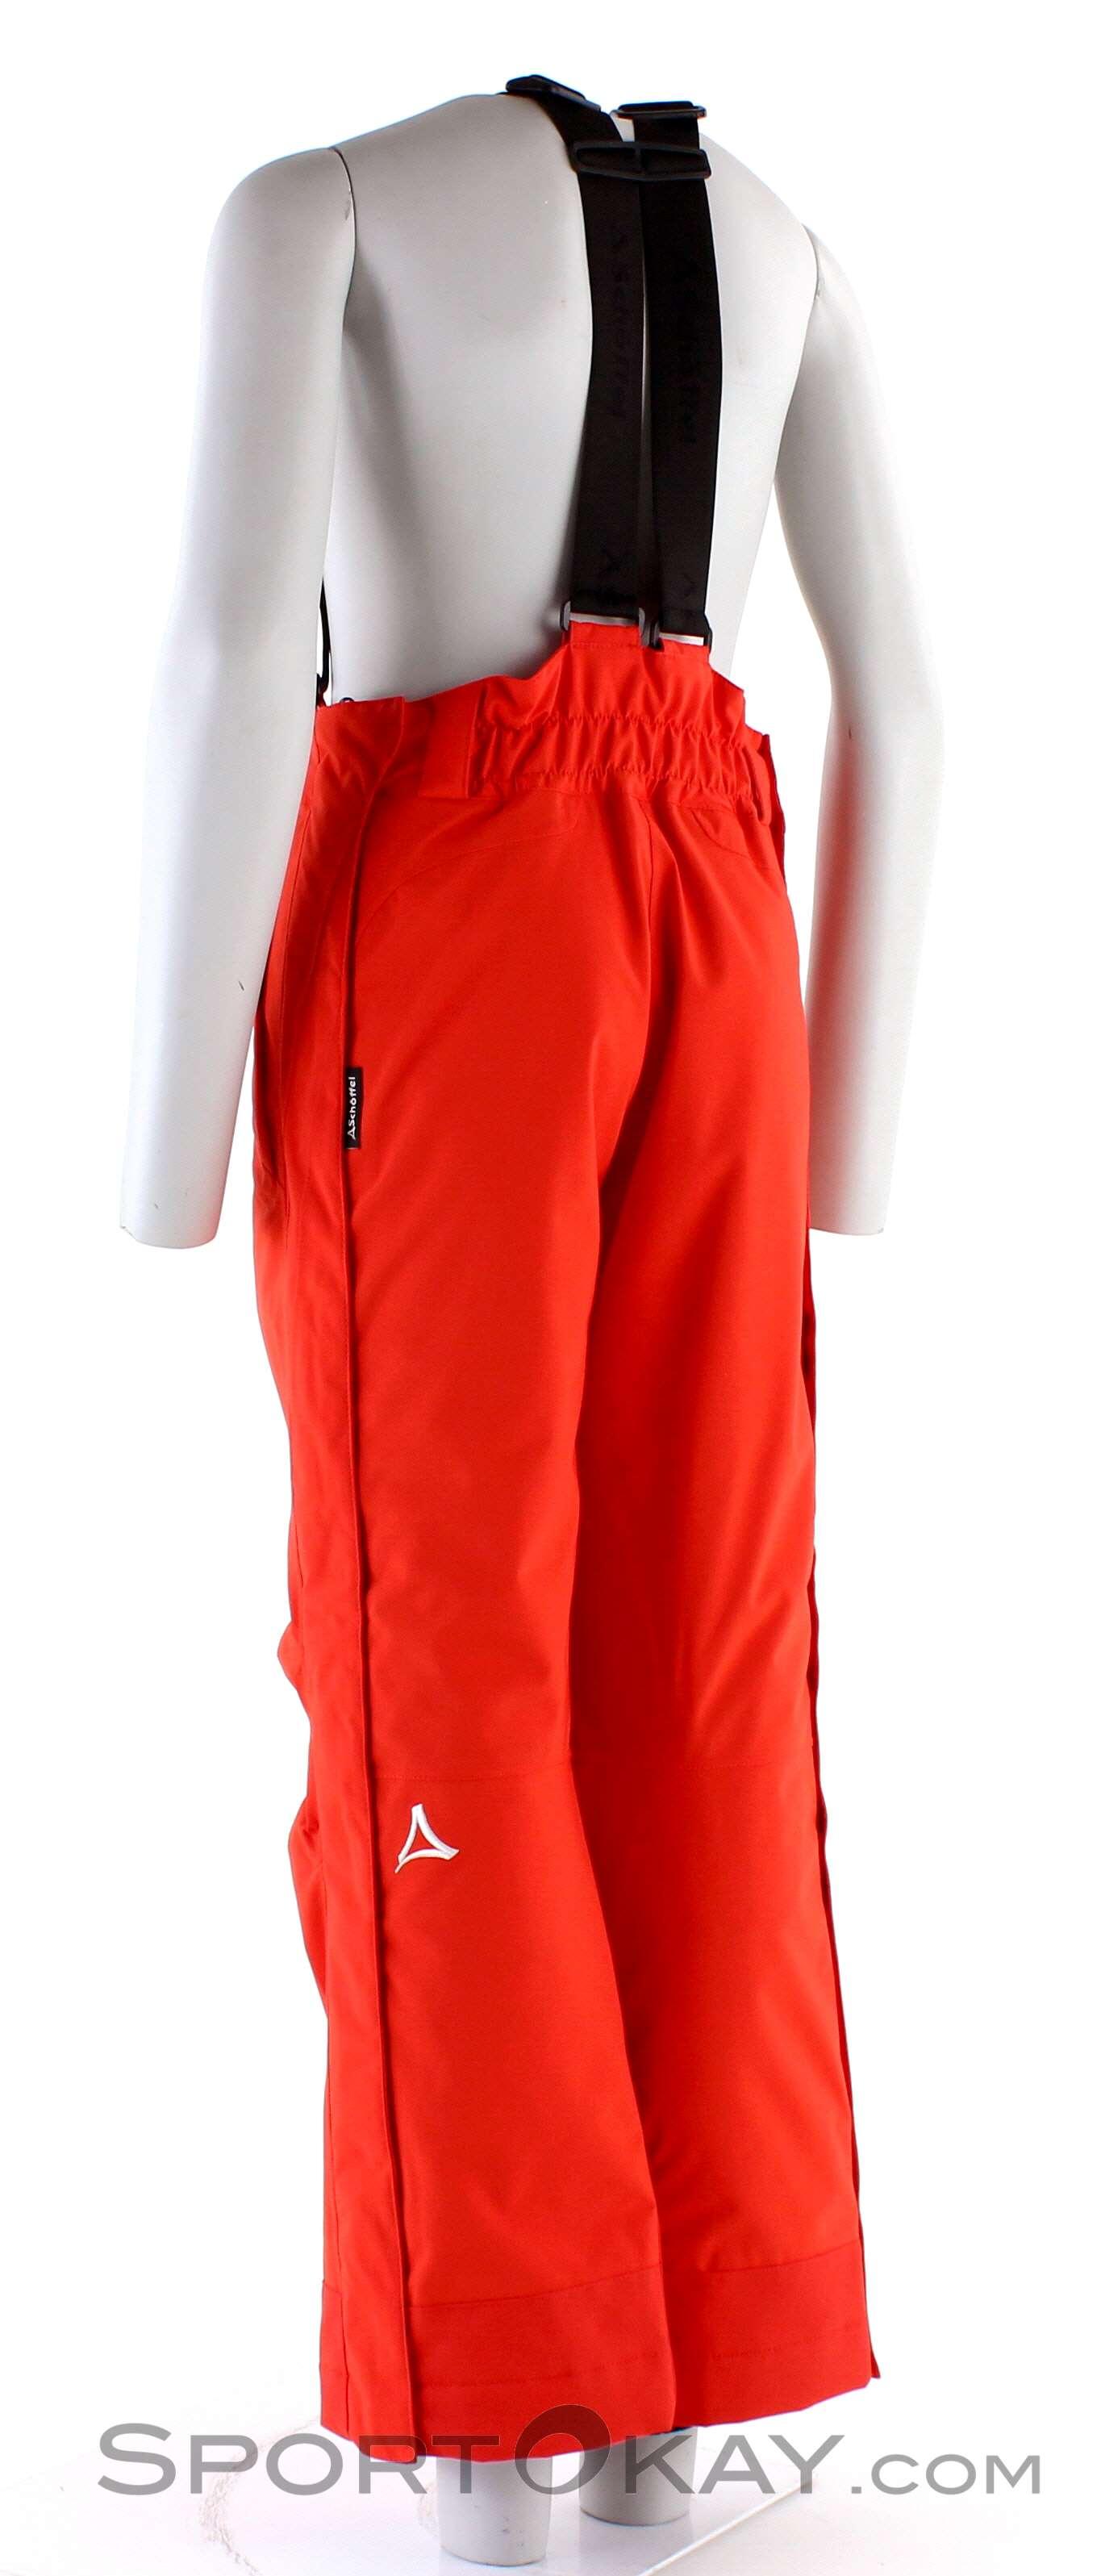 100% genuine hot sale sale usa online Schöffel Schöffel Stretchpants Zip K RT Kids Ski Pants